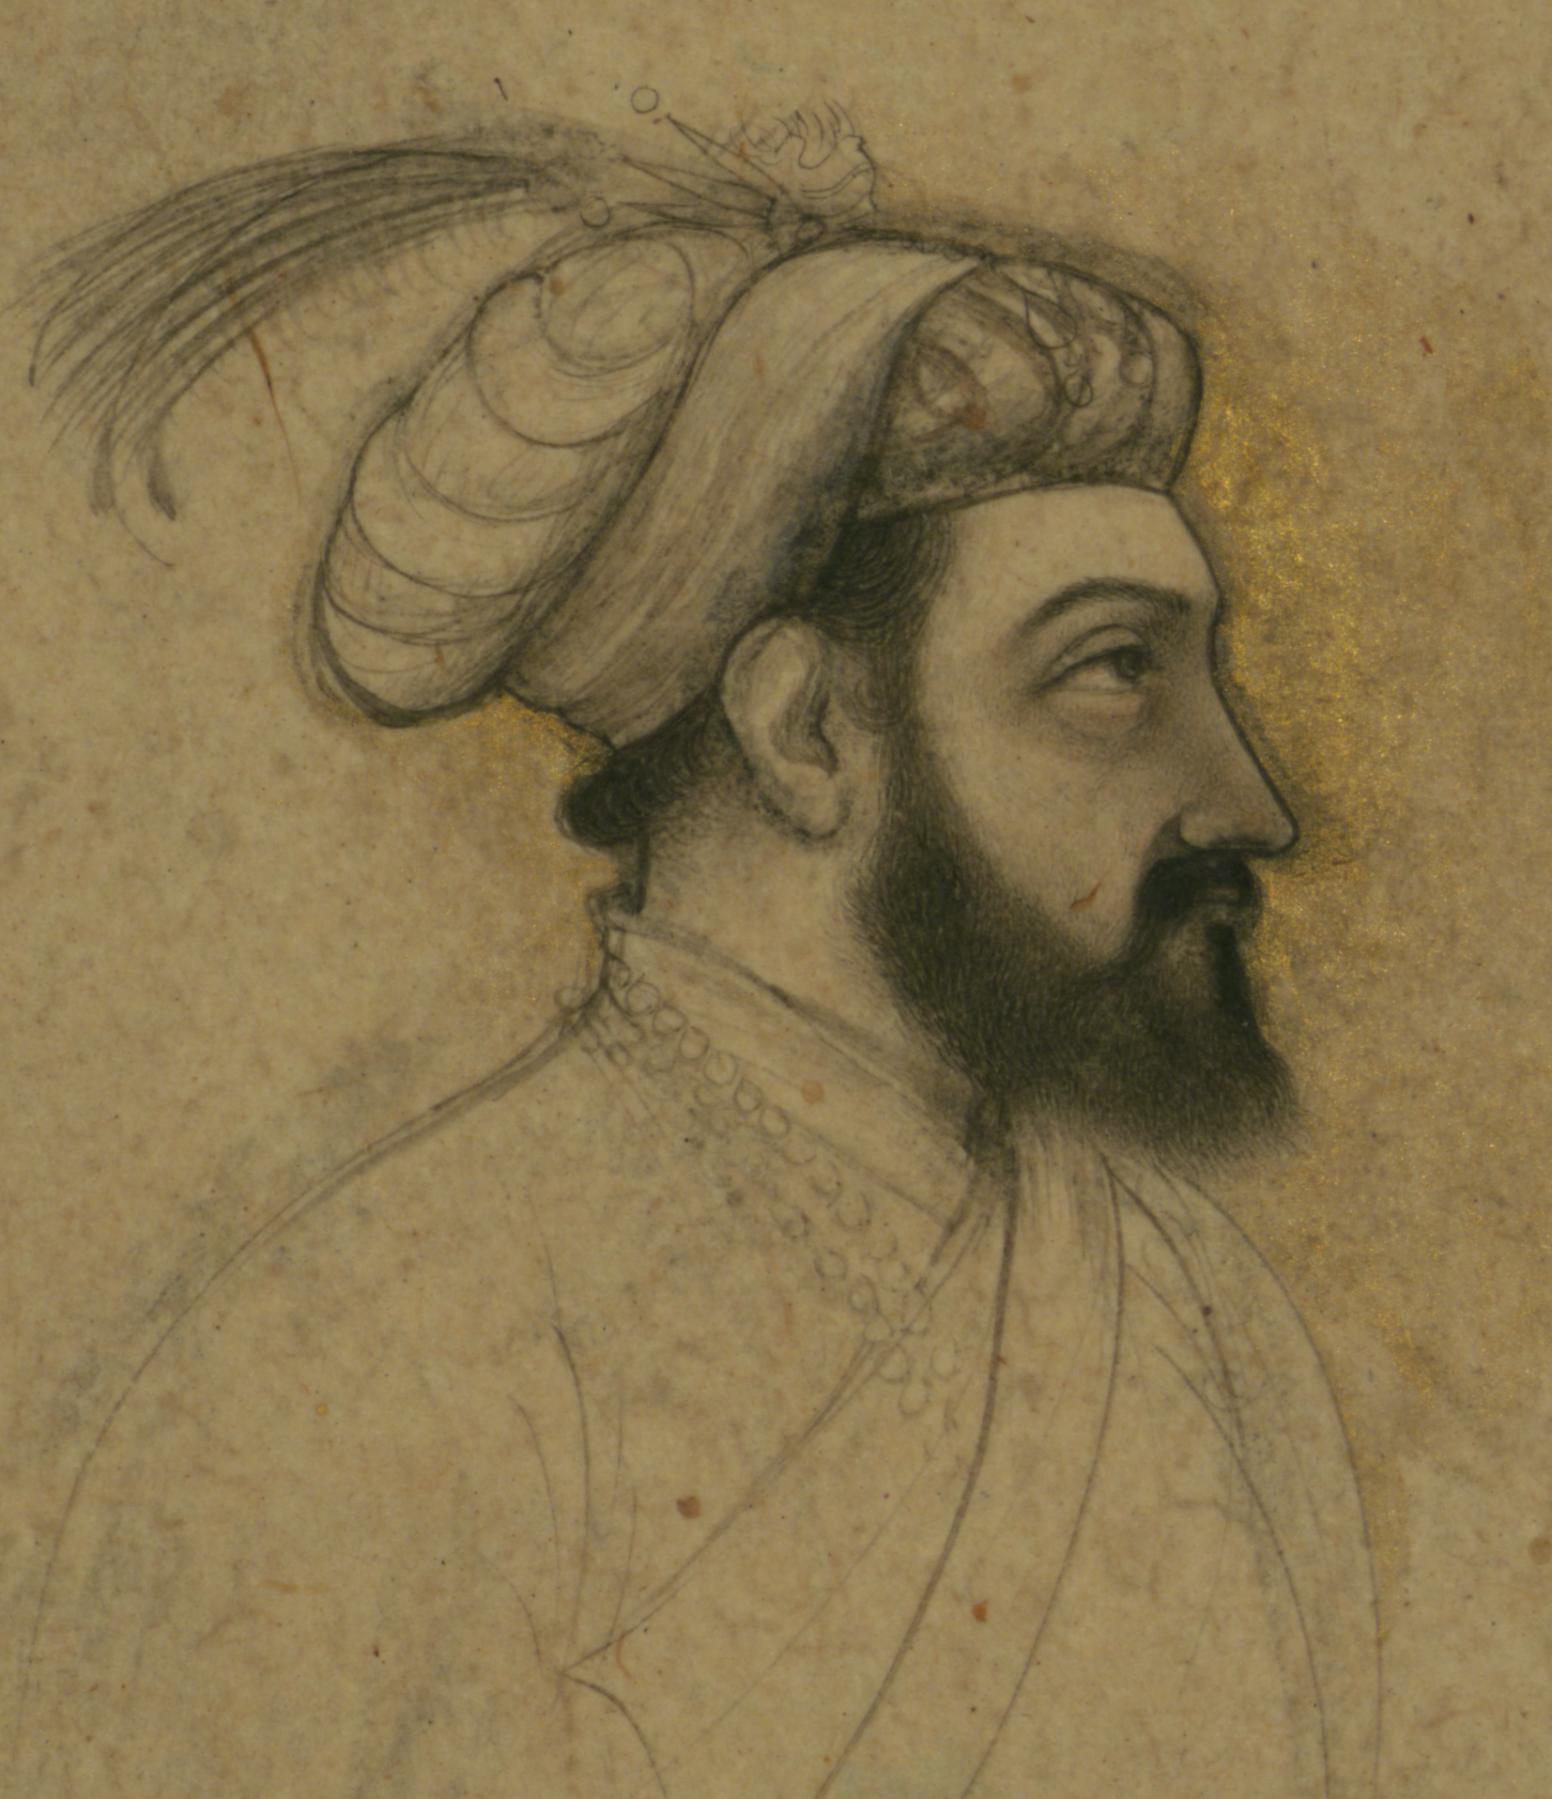 indian - single leaf of a portrait of shah jahan - walters w700 - detail.jpg